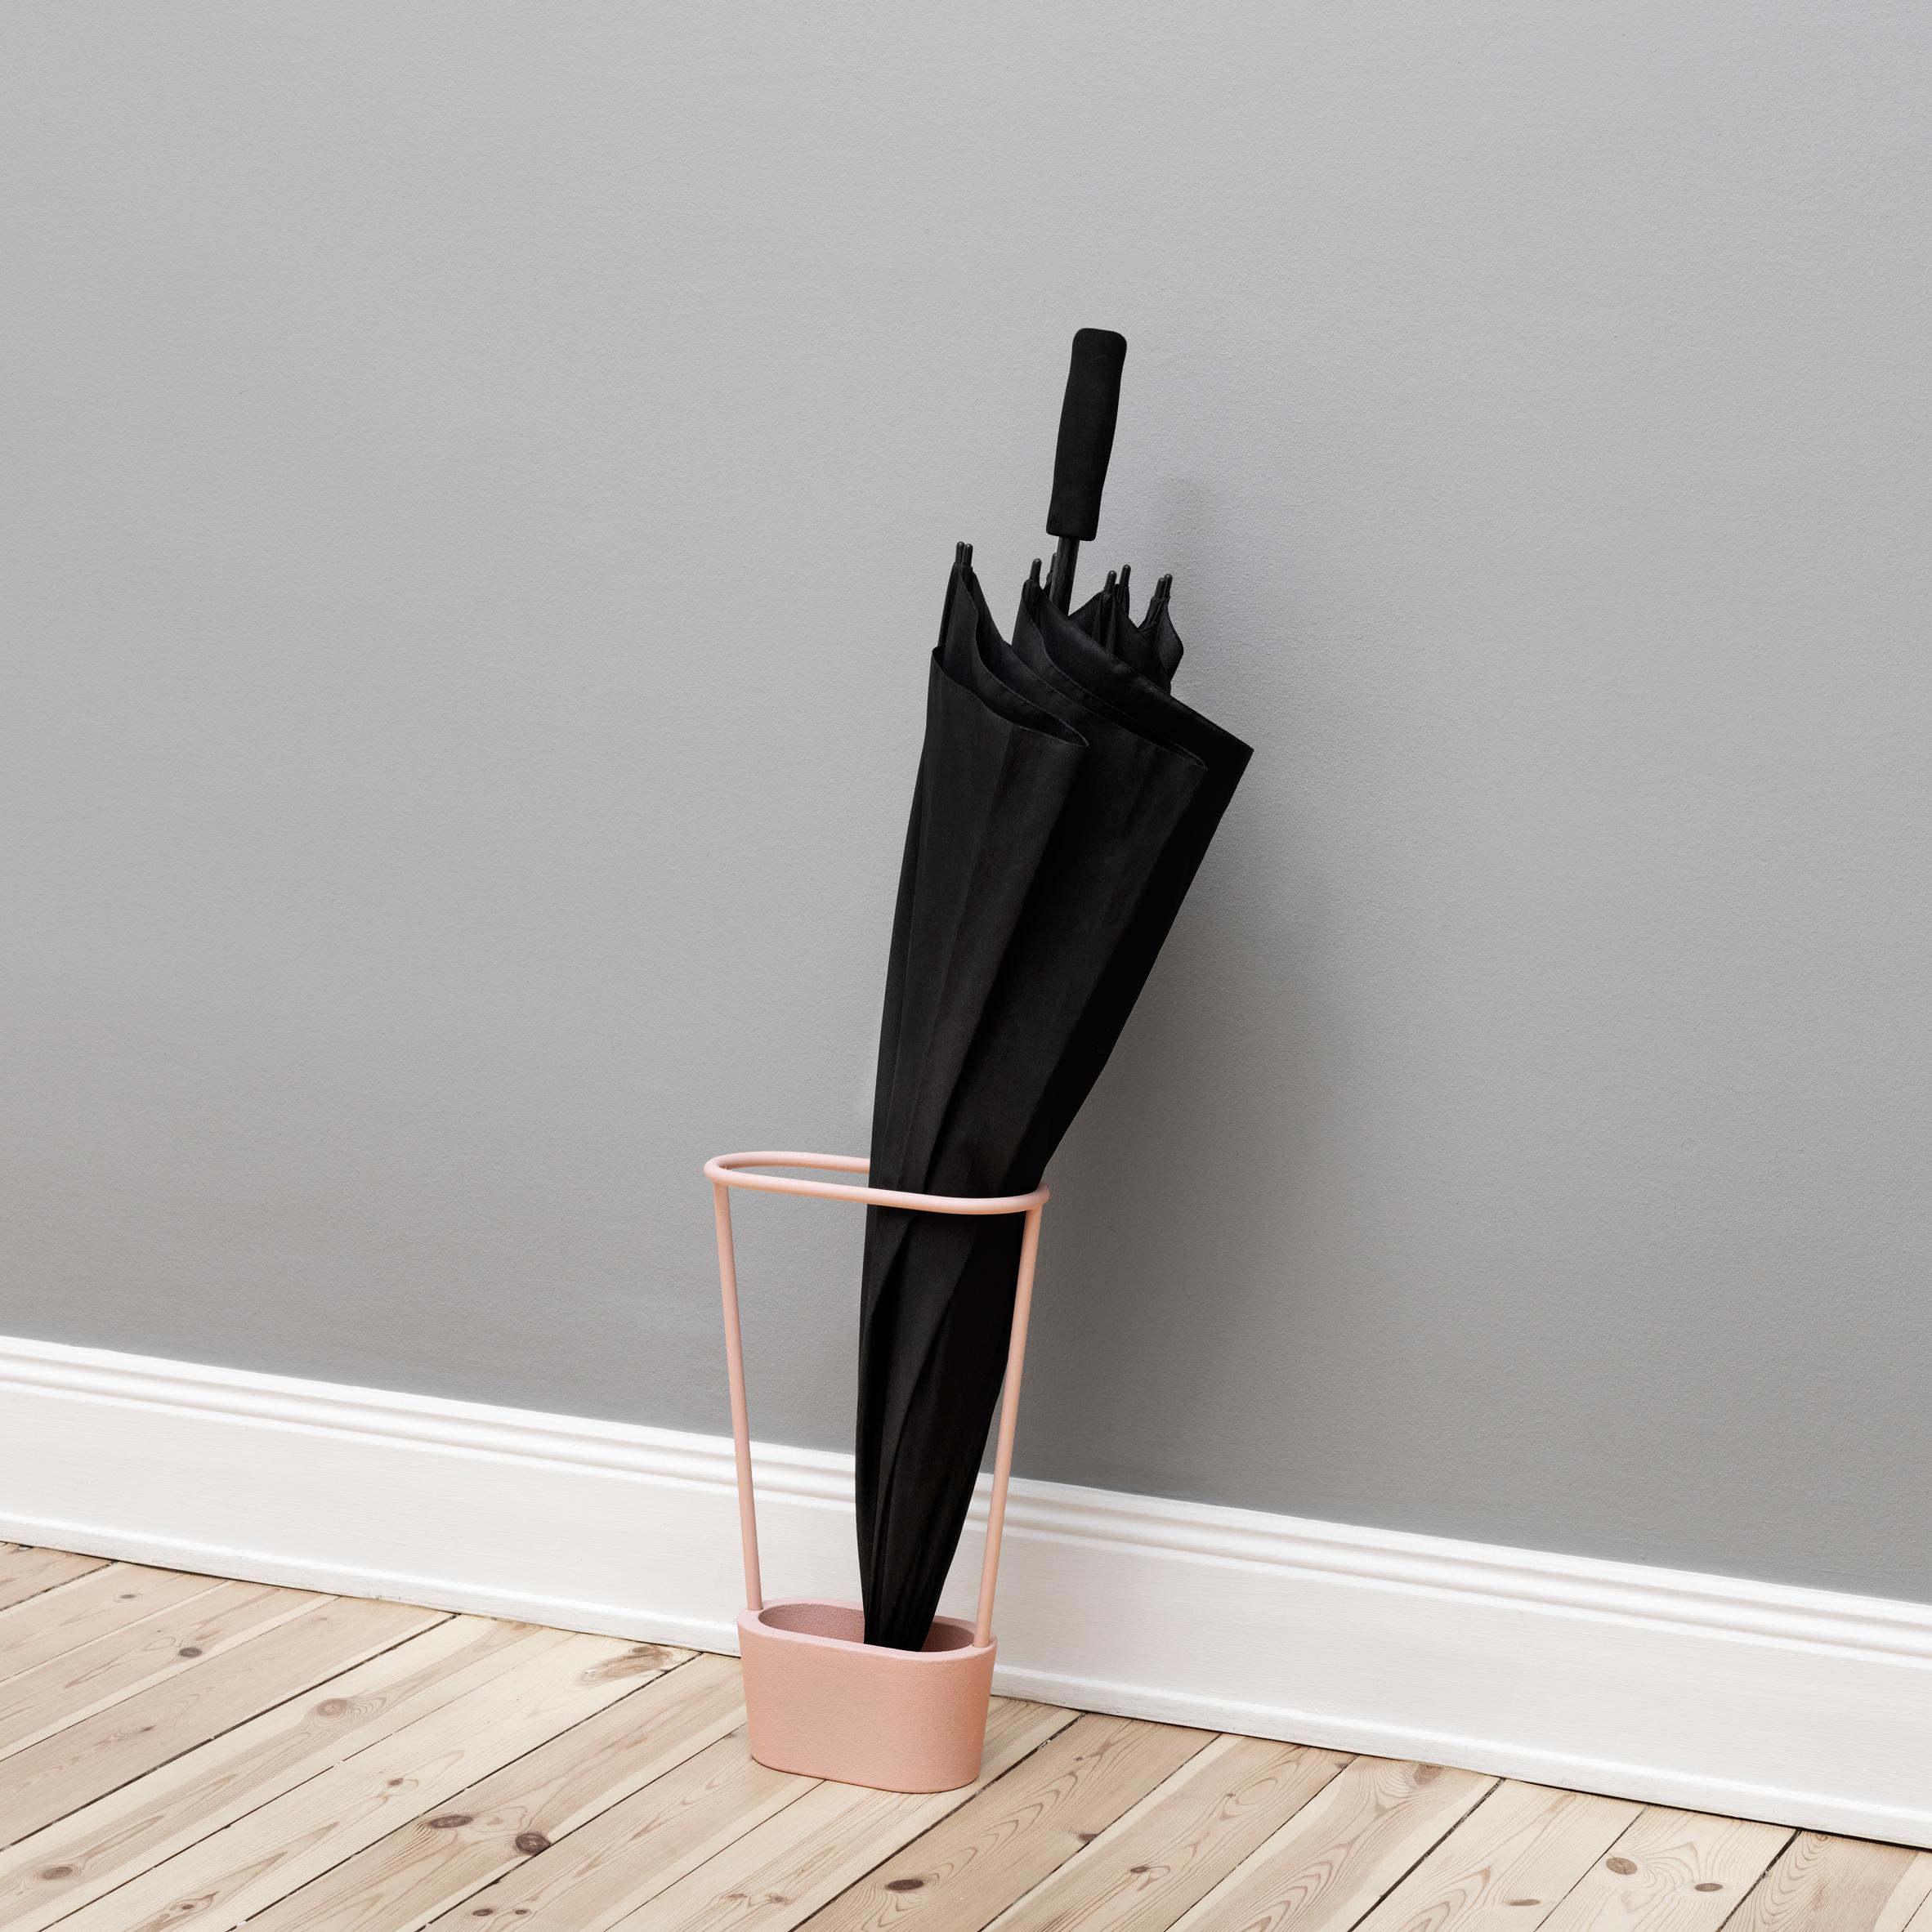 Umbrella Stand Designs : Mika tolvanen designs minimal umbrella stand for naknak